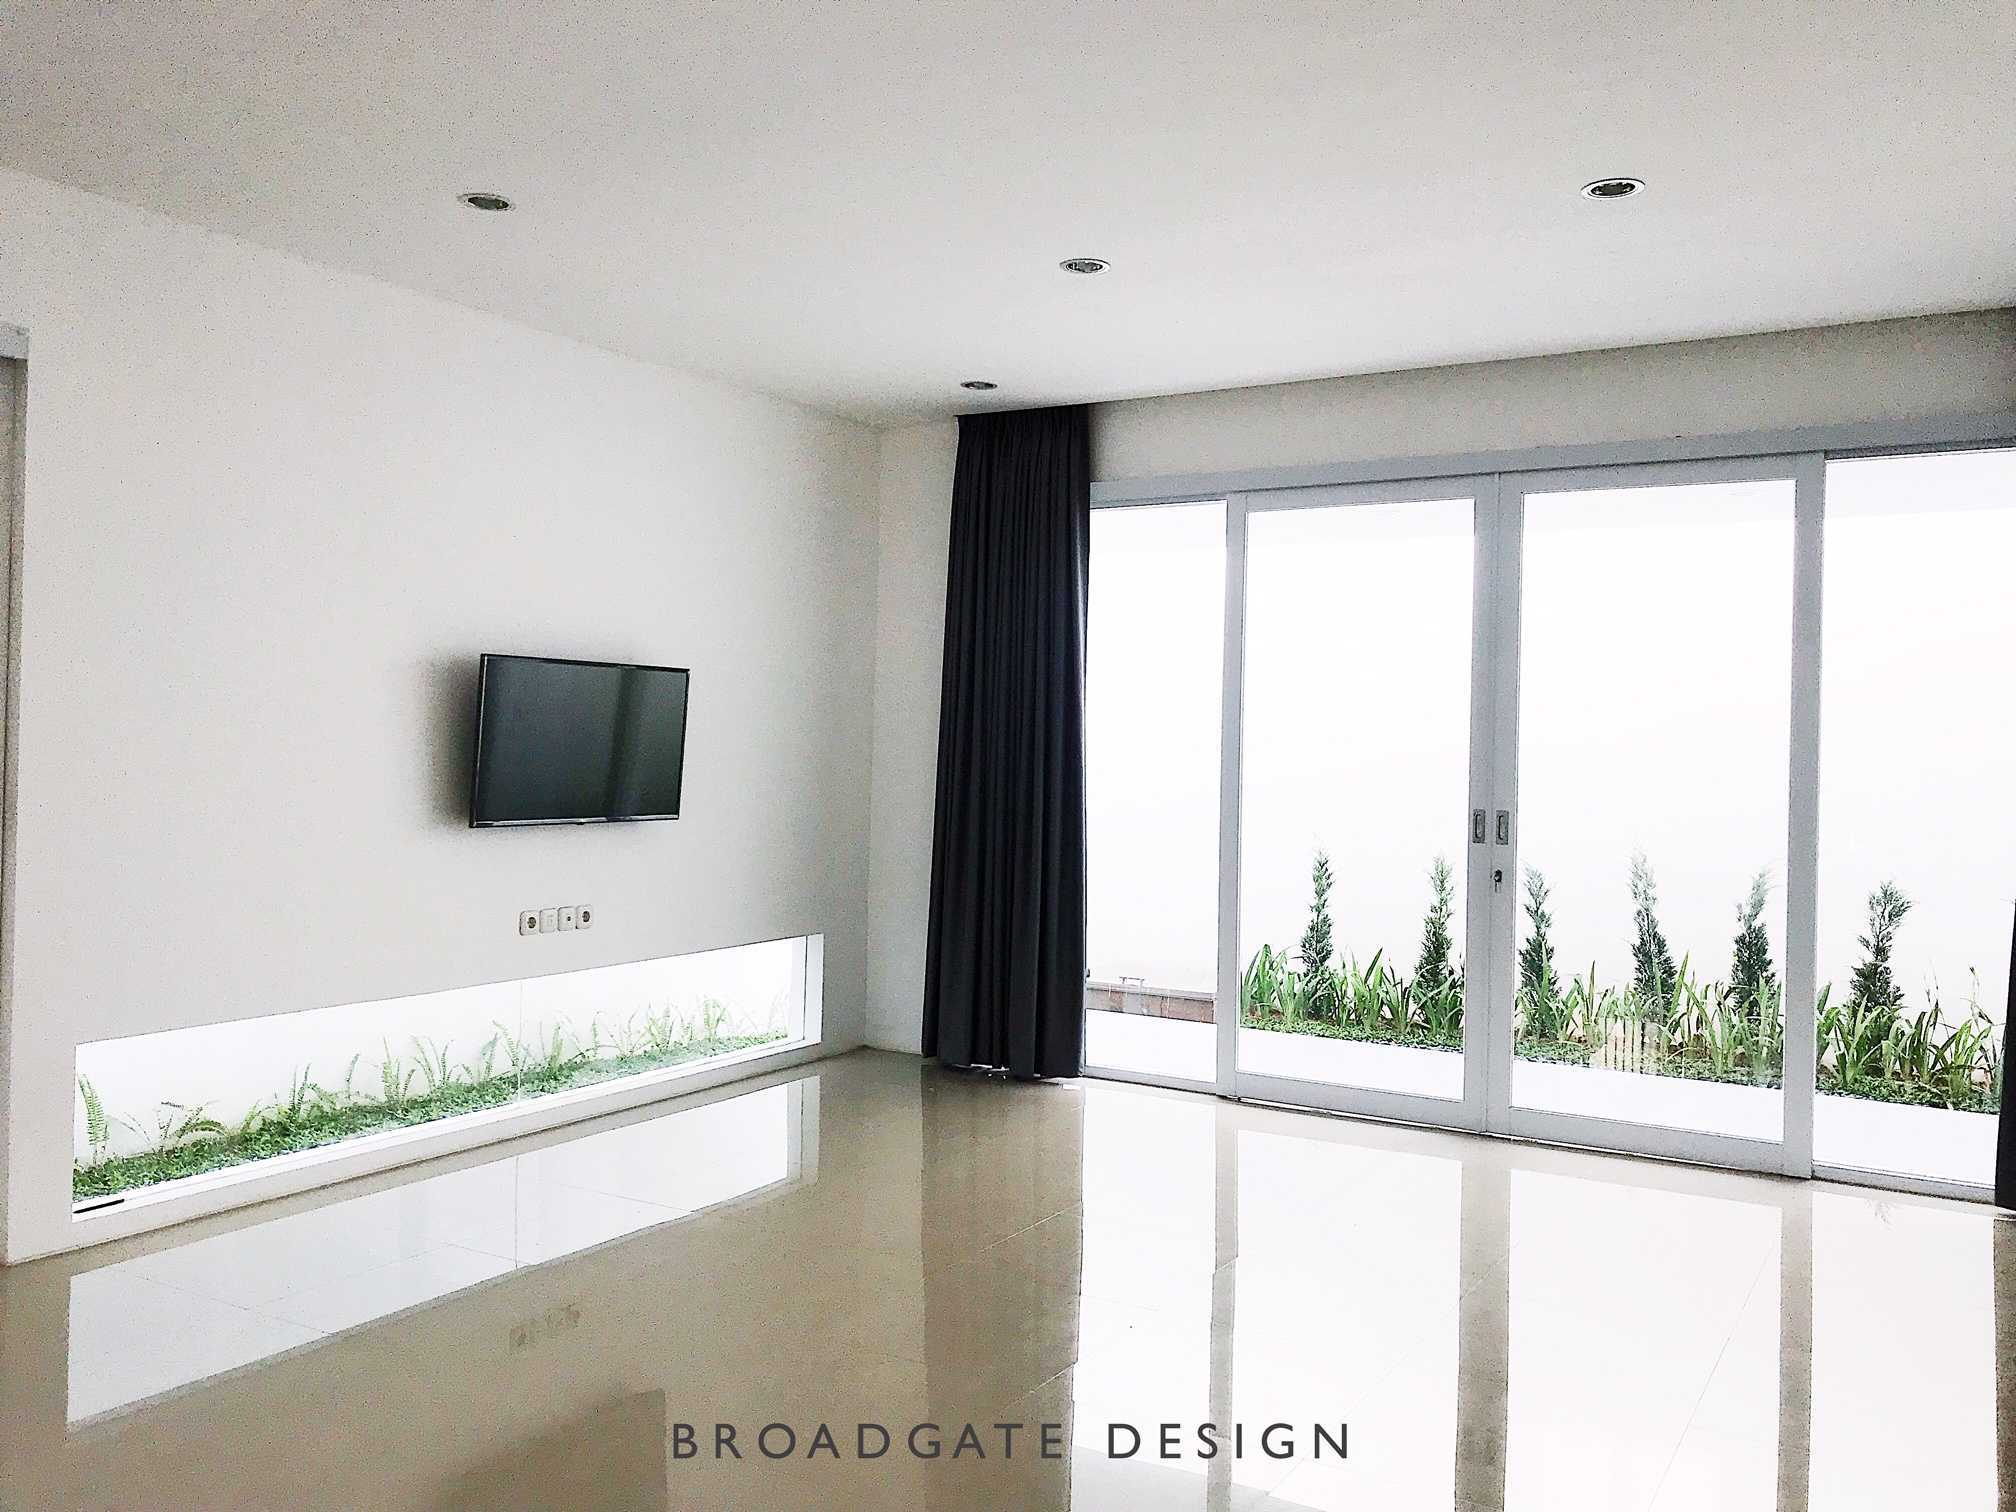 Broadgate Iv House Lippo Karawaci, Binong, Kec. Curug, Tangerang, Banten, Indonesia Lippo Karawaci, Binong, Kec. Curug, Tangerang, Banten, Indonesia Broadgate-Iv-House  74180